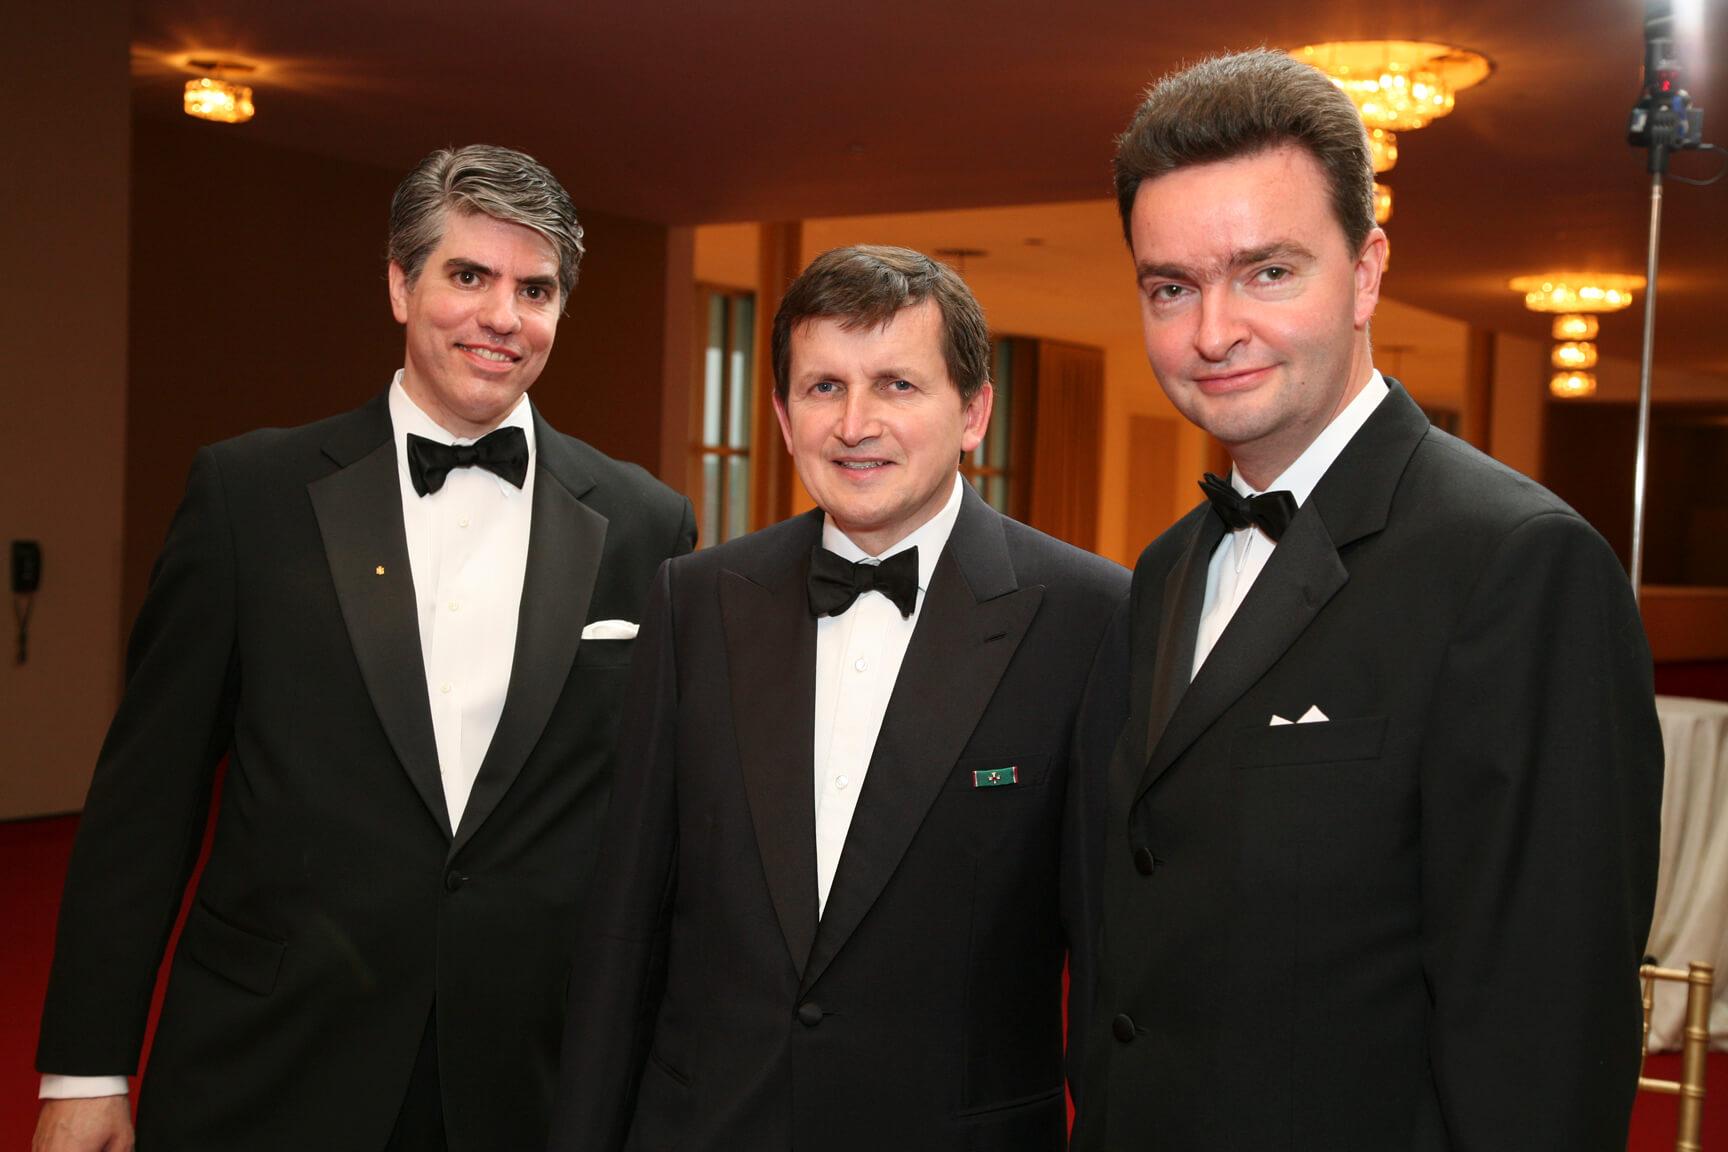 Mr. Maximilian Teleki HAC President, Dr. Charles Simonyi, and Ambassador Georg von Habsburg